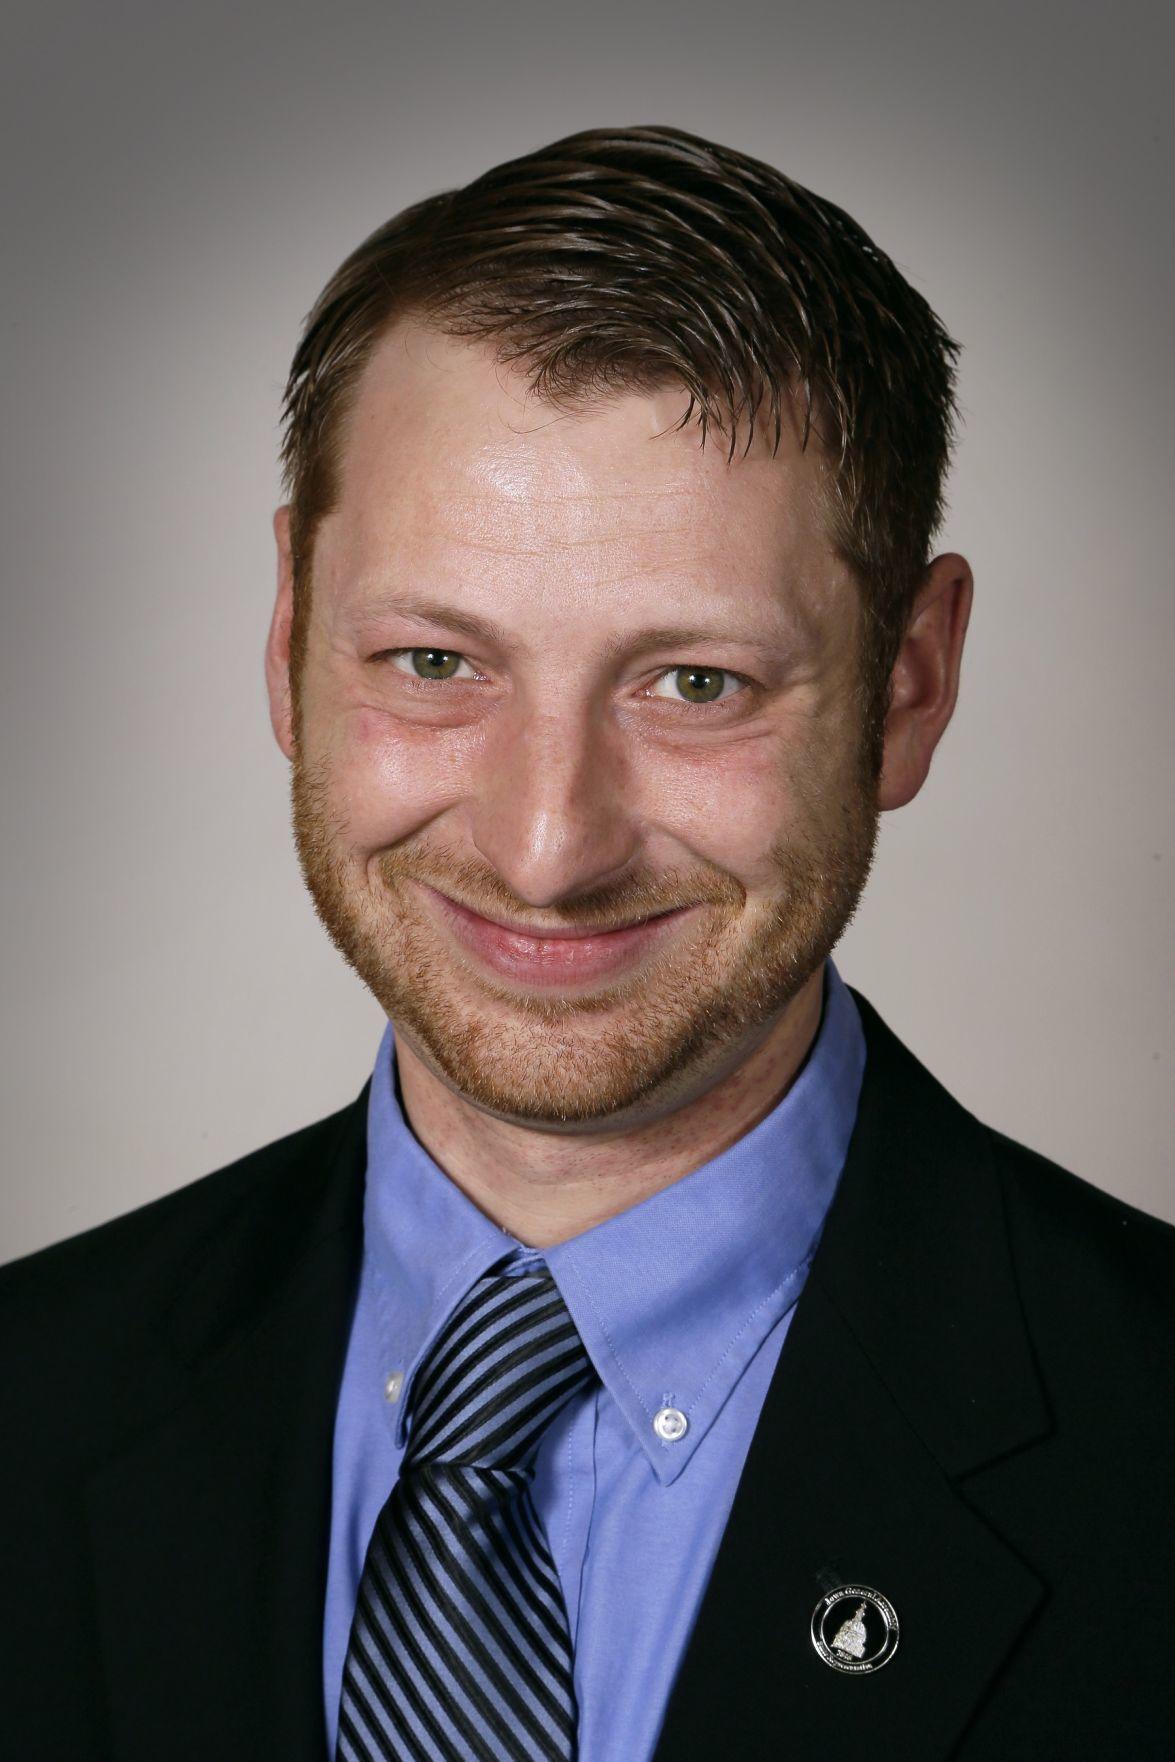 Iowa state Rep. Jarad Klein